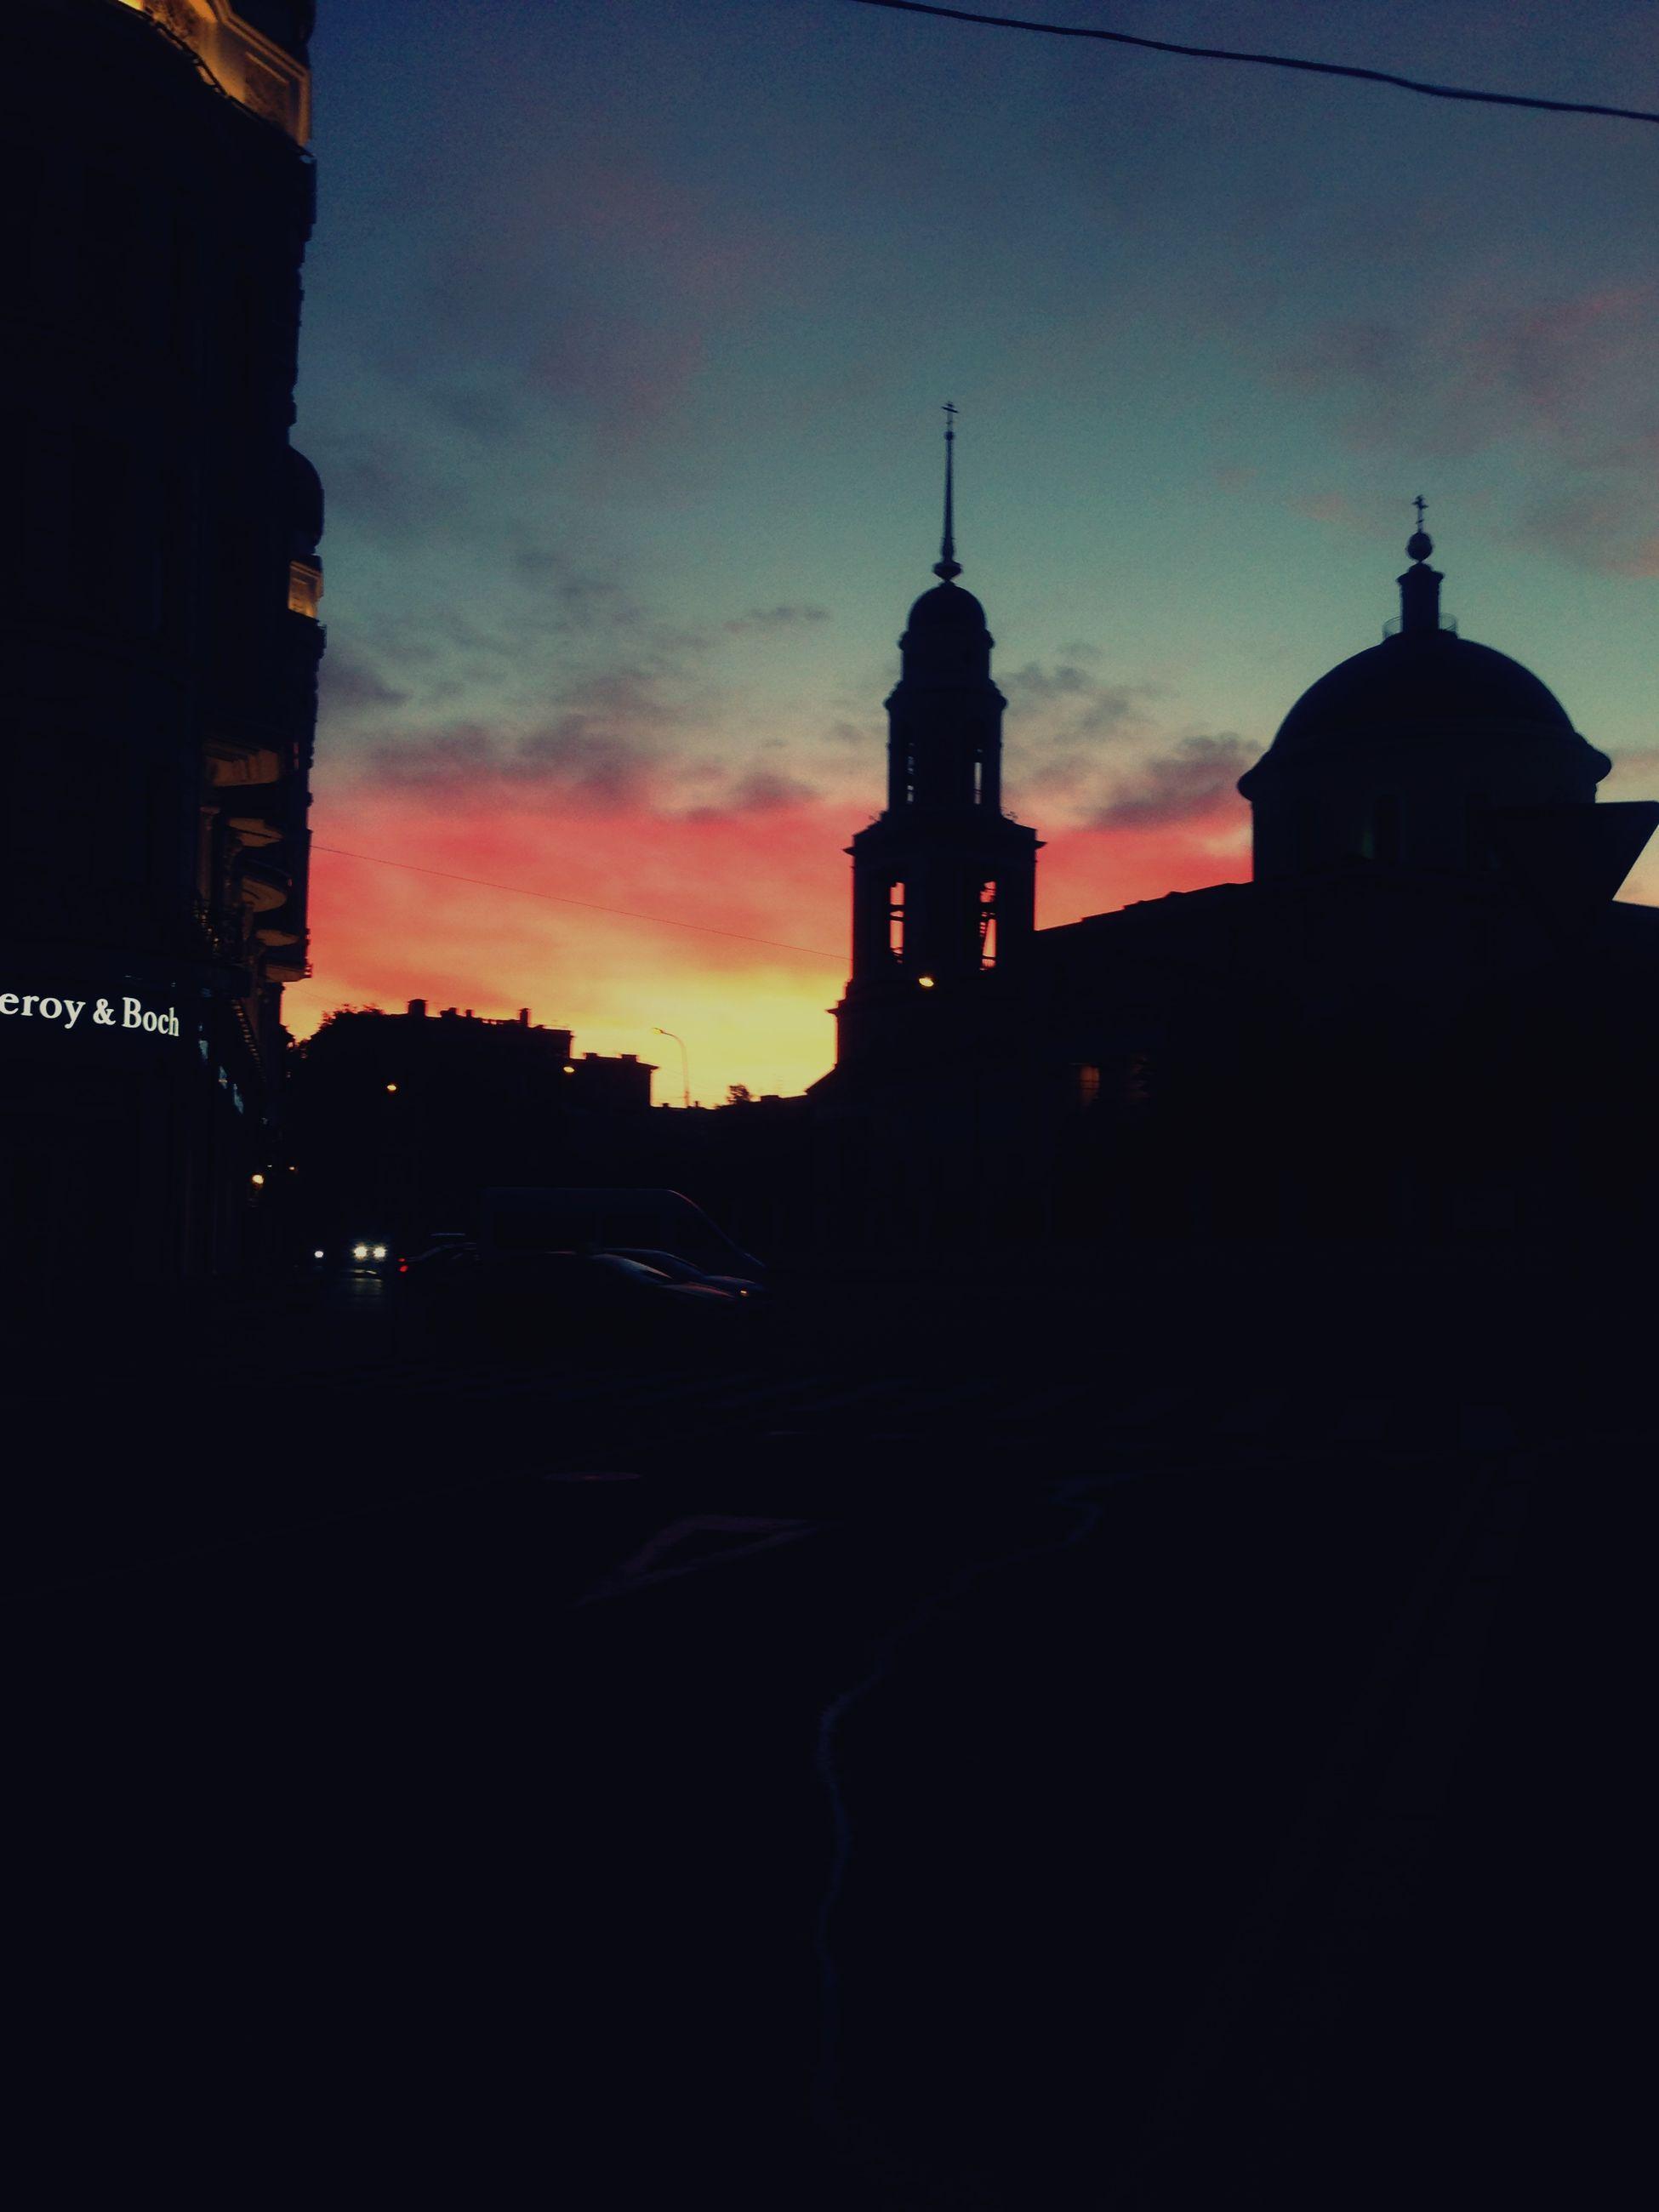 building exterior, architecture, sunset, built structure, sky, silhouette, church, religion, place of worship, transportation, dusk, orange color, spirituality, cloud - sky, city, dome, tower, cloud